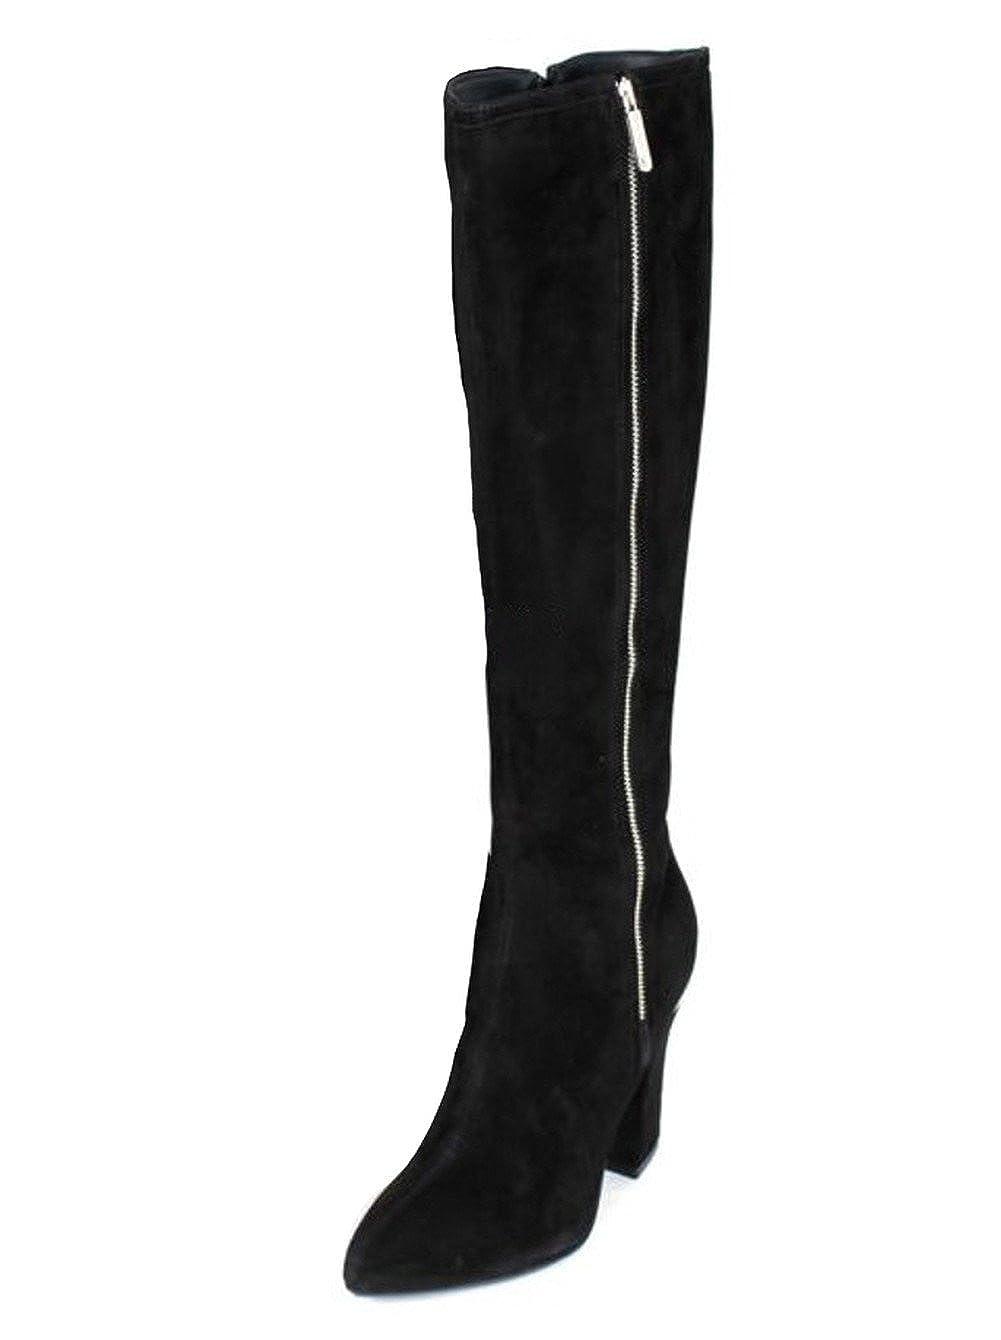 Samsonite Damenschuhe schuhe Stiefel Stiefel 102259 Gr.36